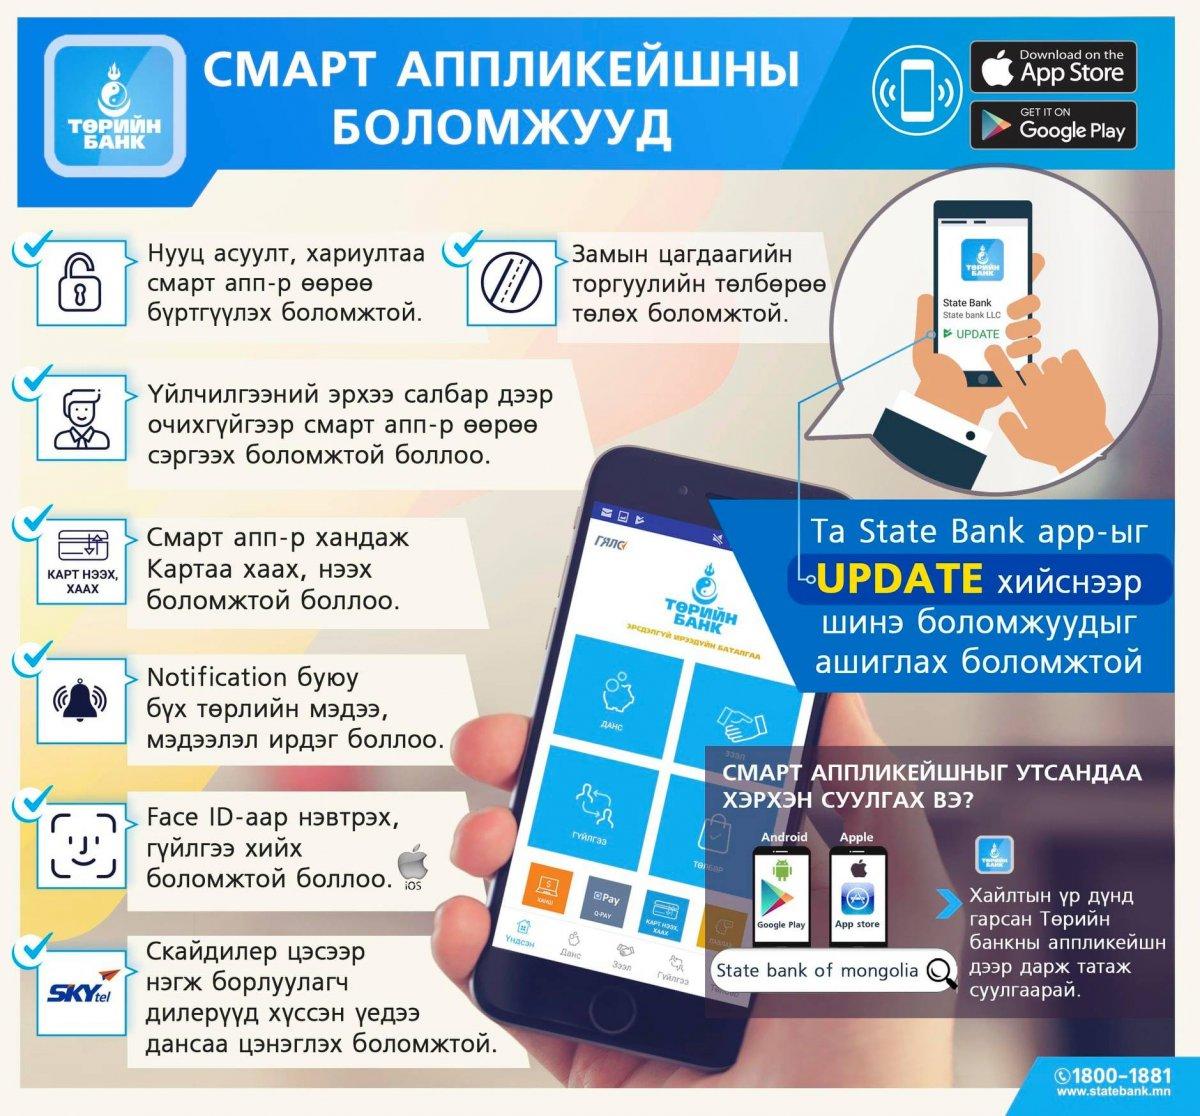 ГЯЛСБАНК смарт аппликейшны БОЛОМЖУУД